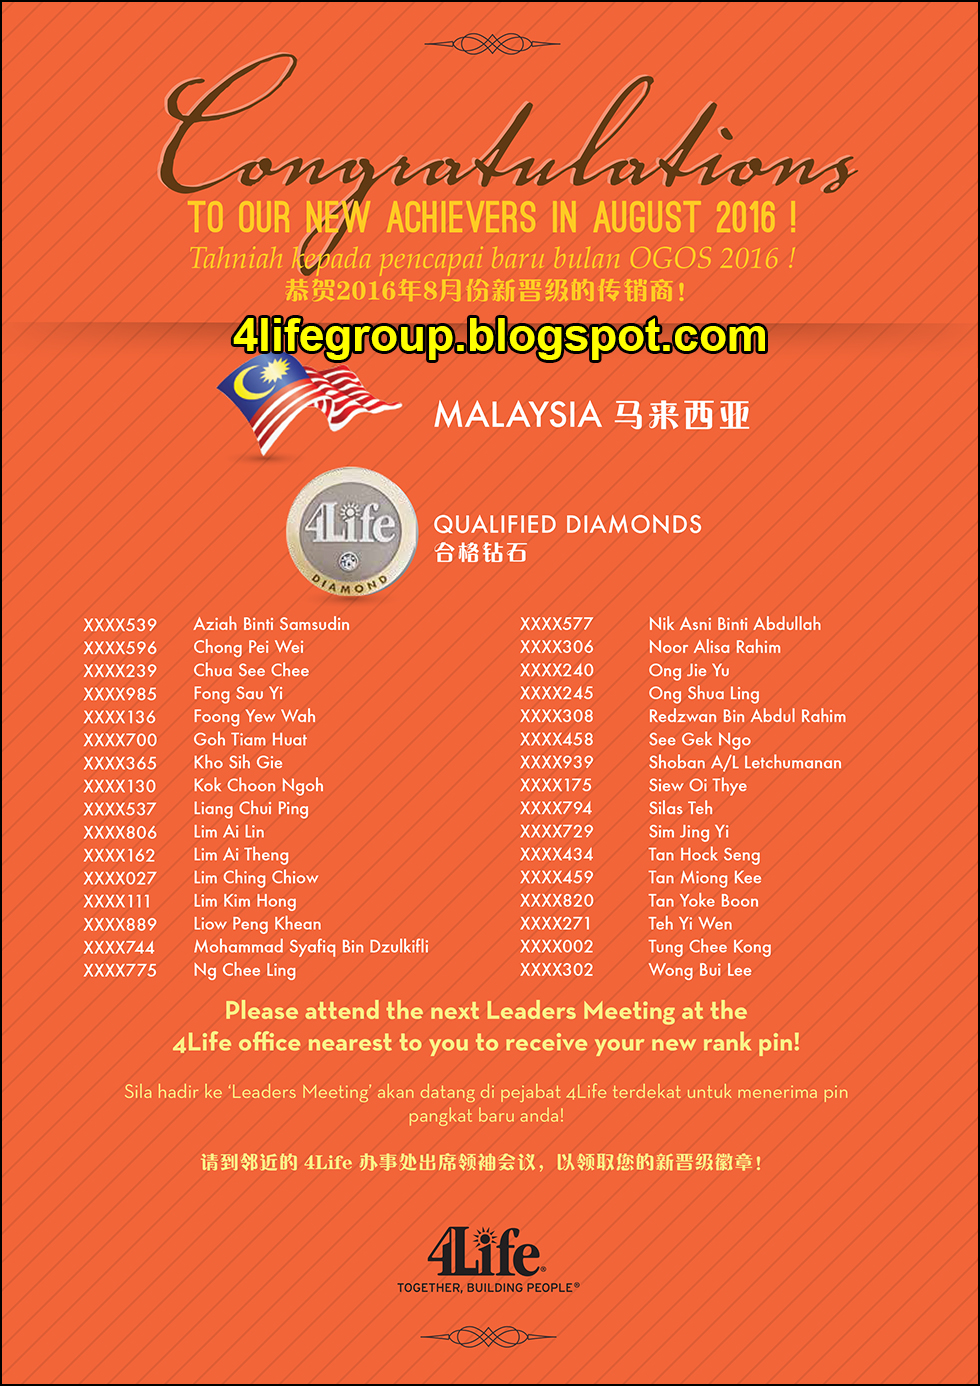 foto Pencapai Pangkat Baru Ogos 2016 4Life Malaysia (2)